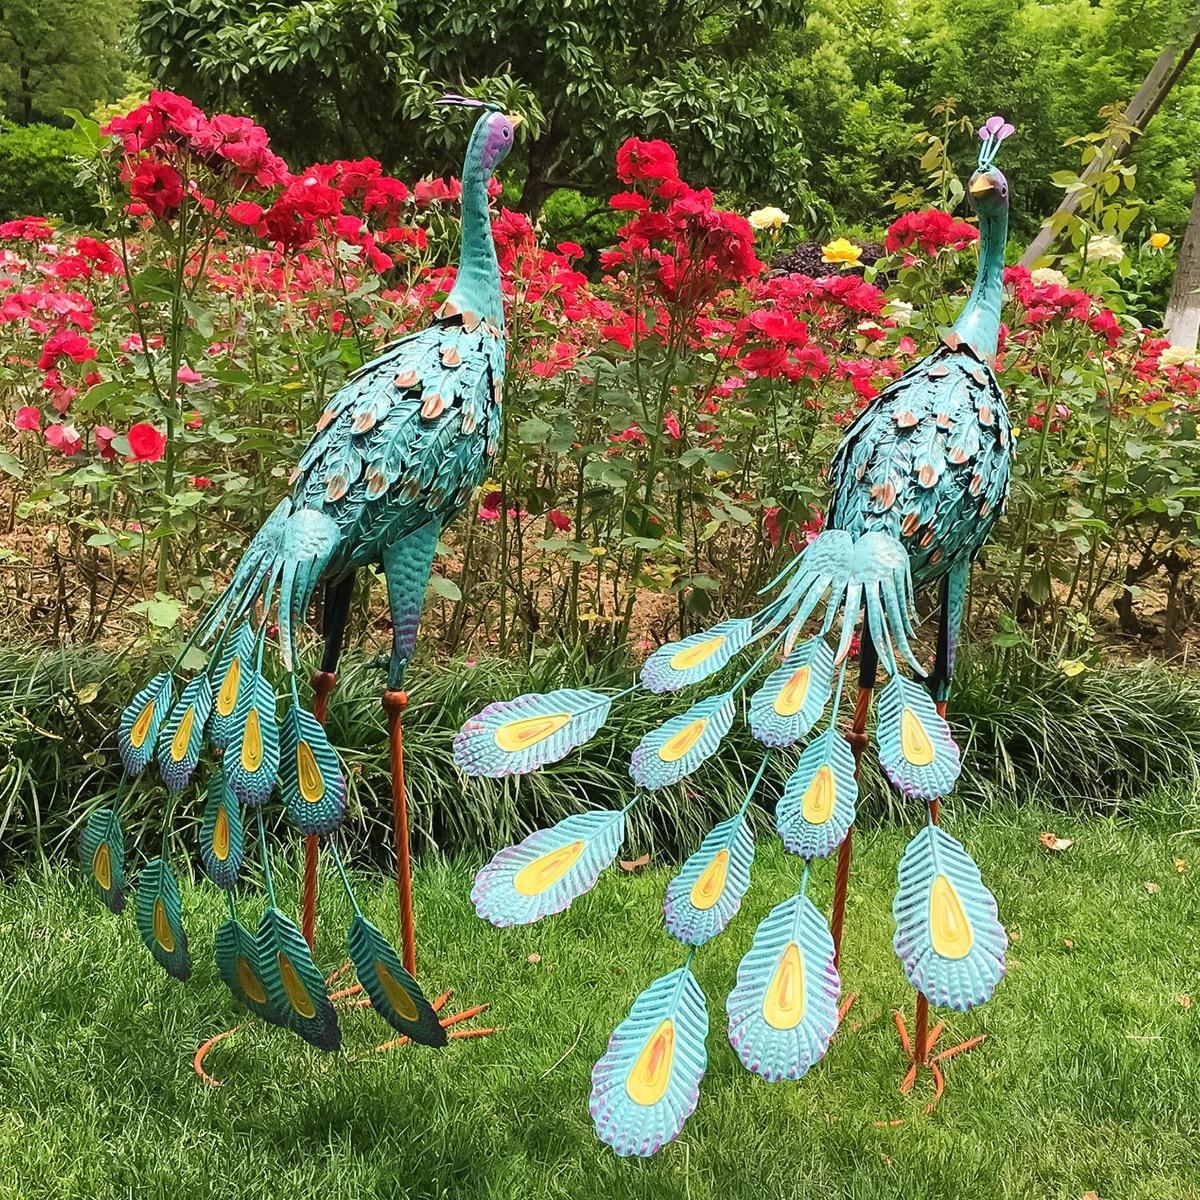 Artificial Peacock Garden Ornament Animal Patio Ornament Indoor Outdoor Gift